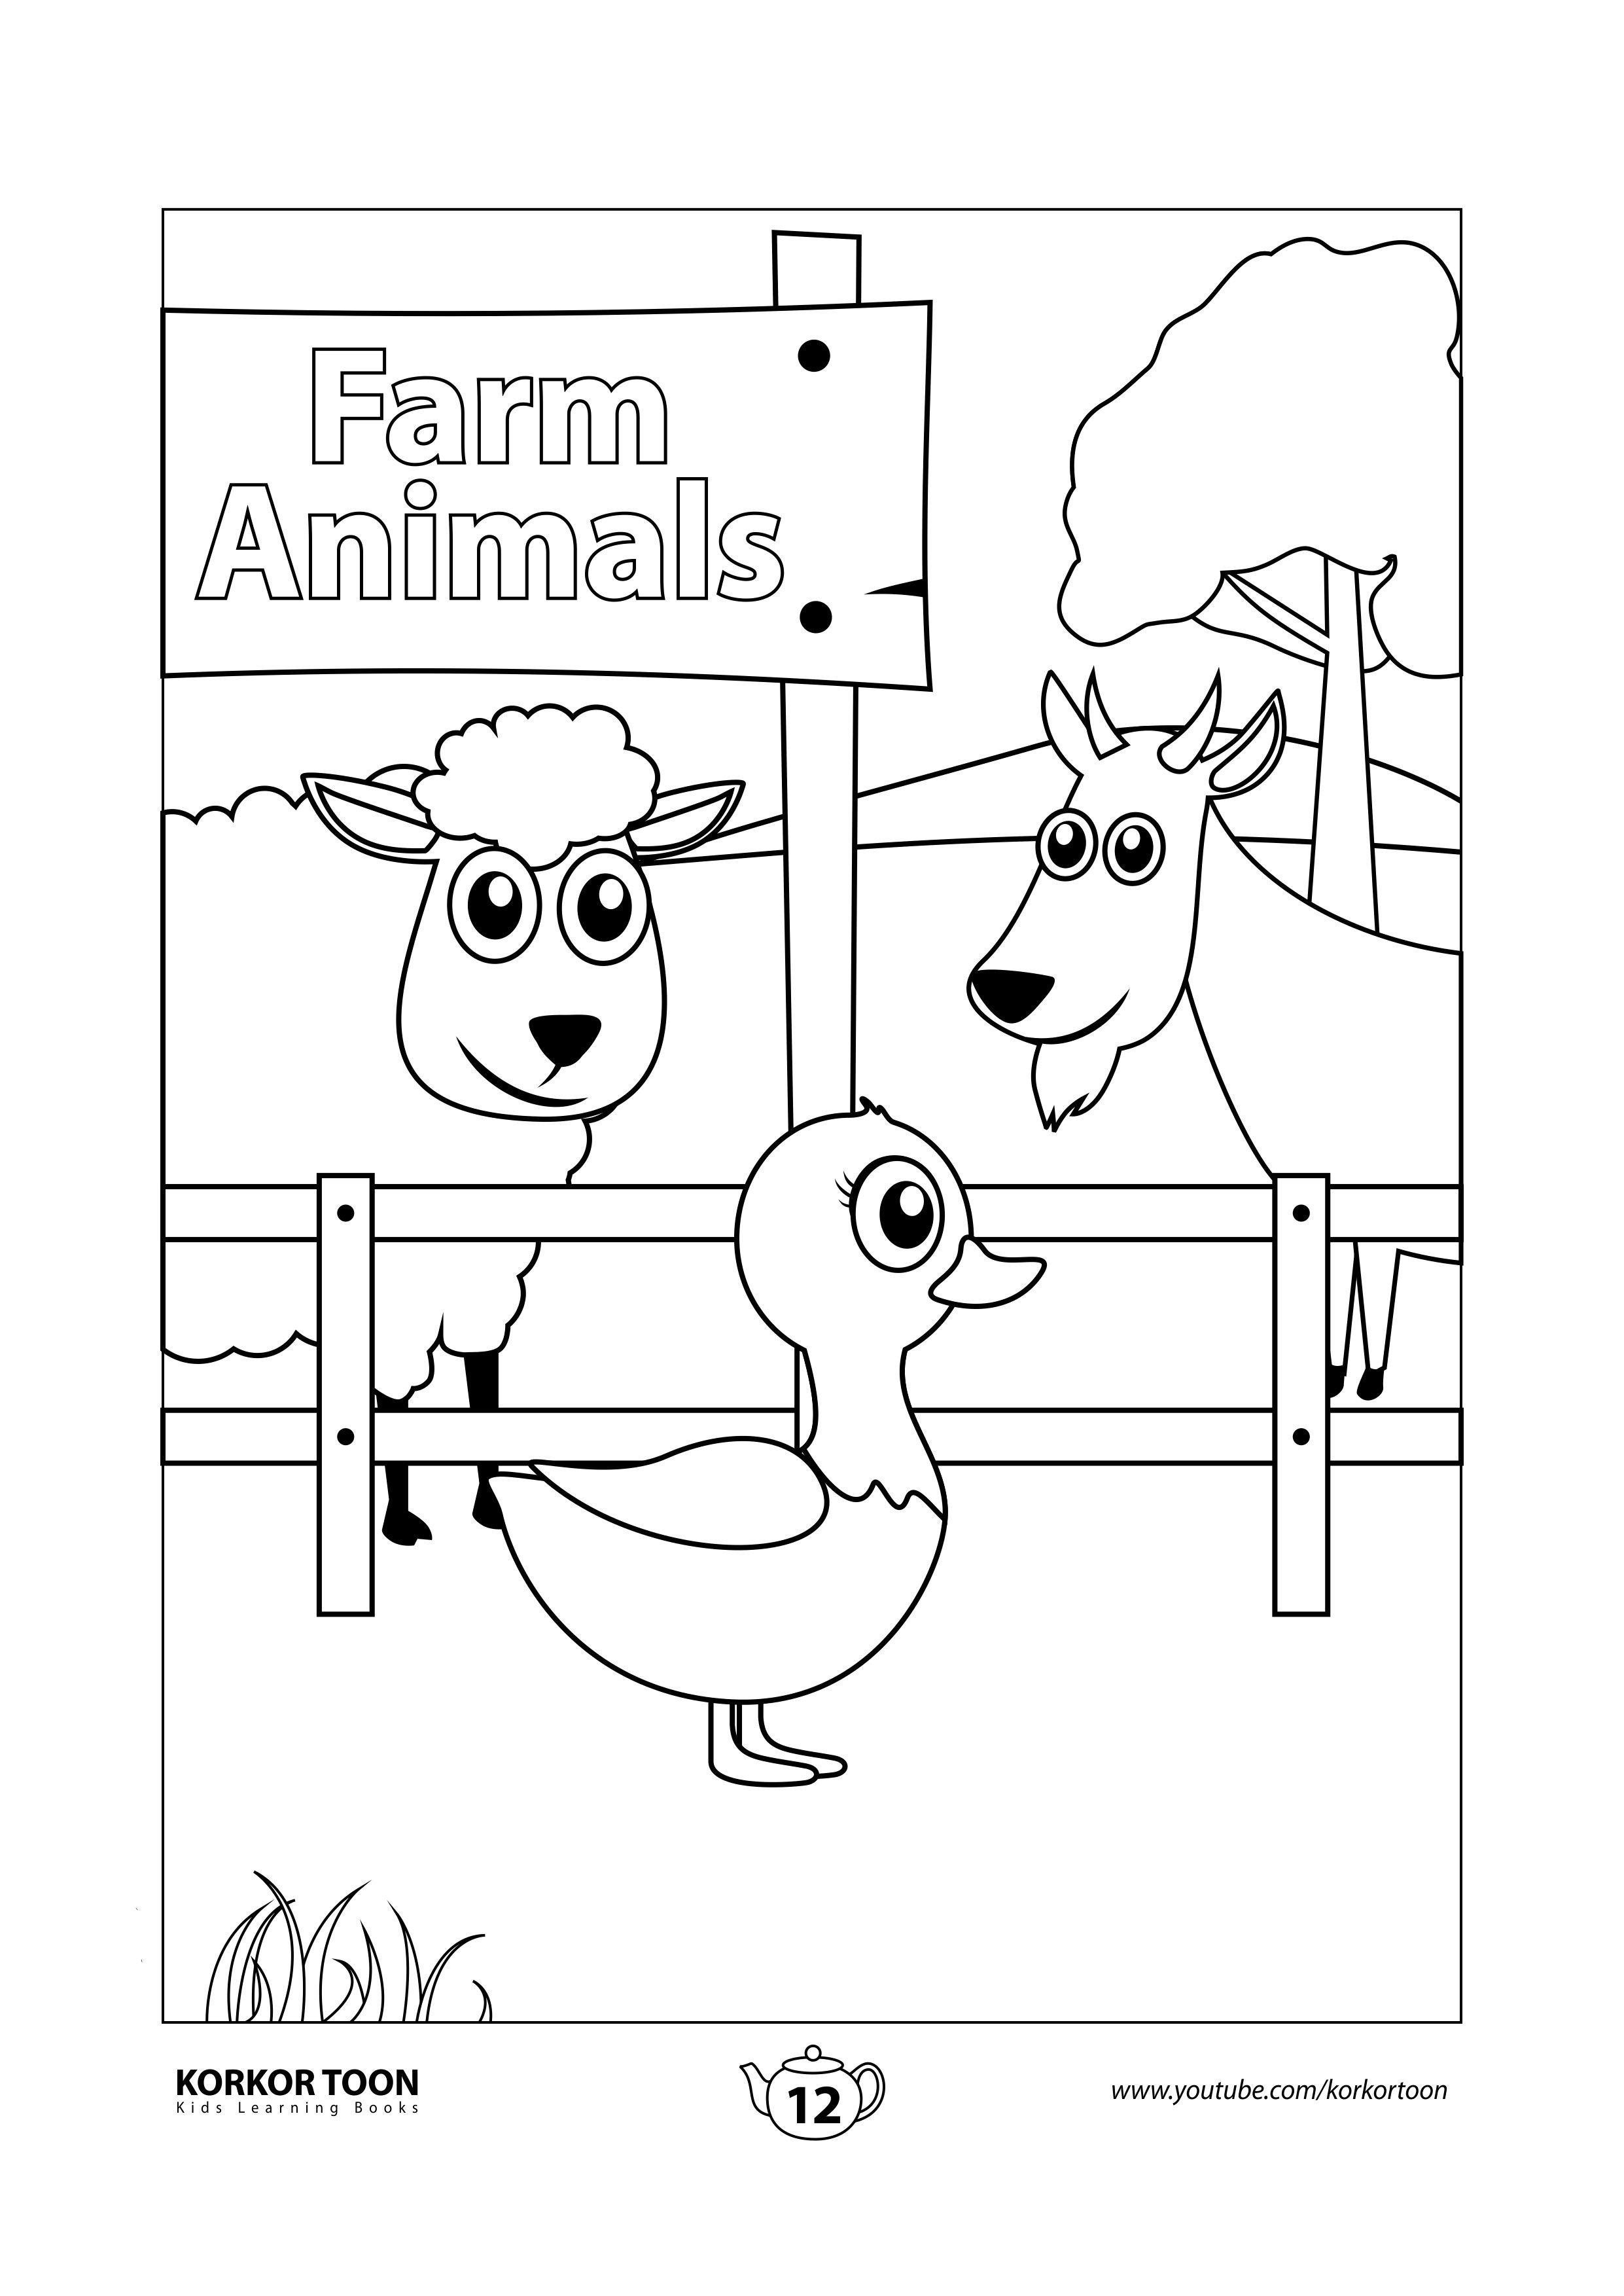 Farm Animals Coloring Page Farm Animals Coloring Book Coloring Books Animal Coloring Books Kids Coloring Books